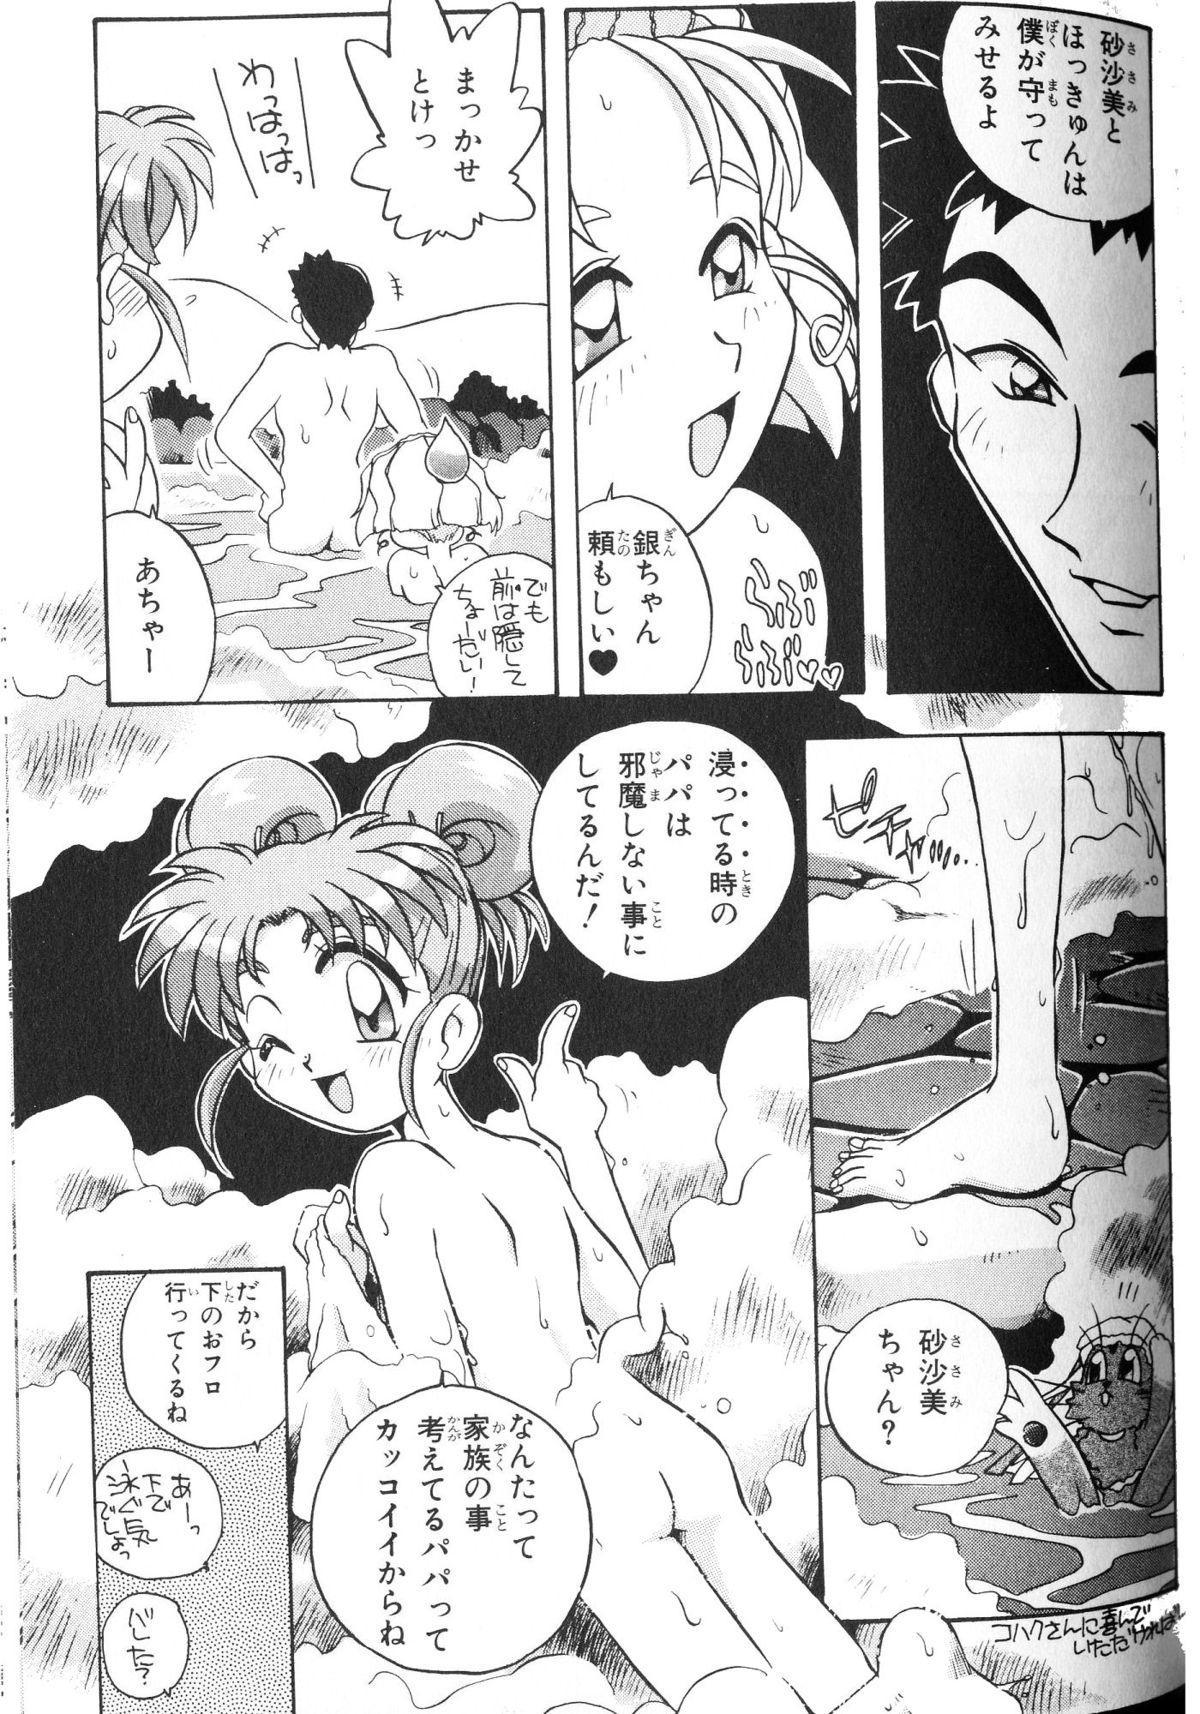 PRETTY SAMY - TATAKAU ONSEN 5